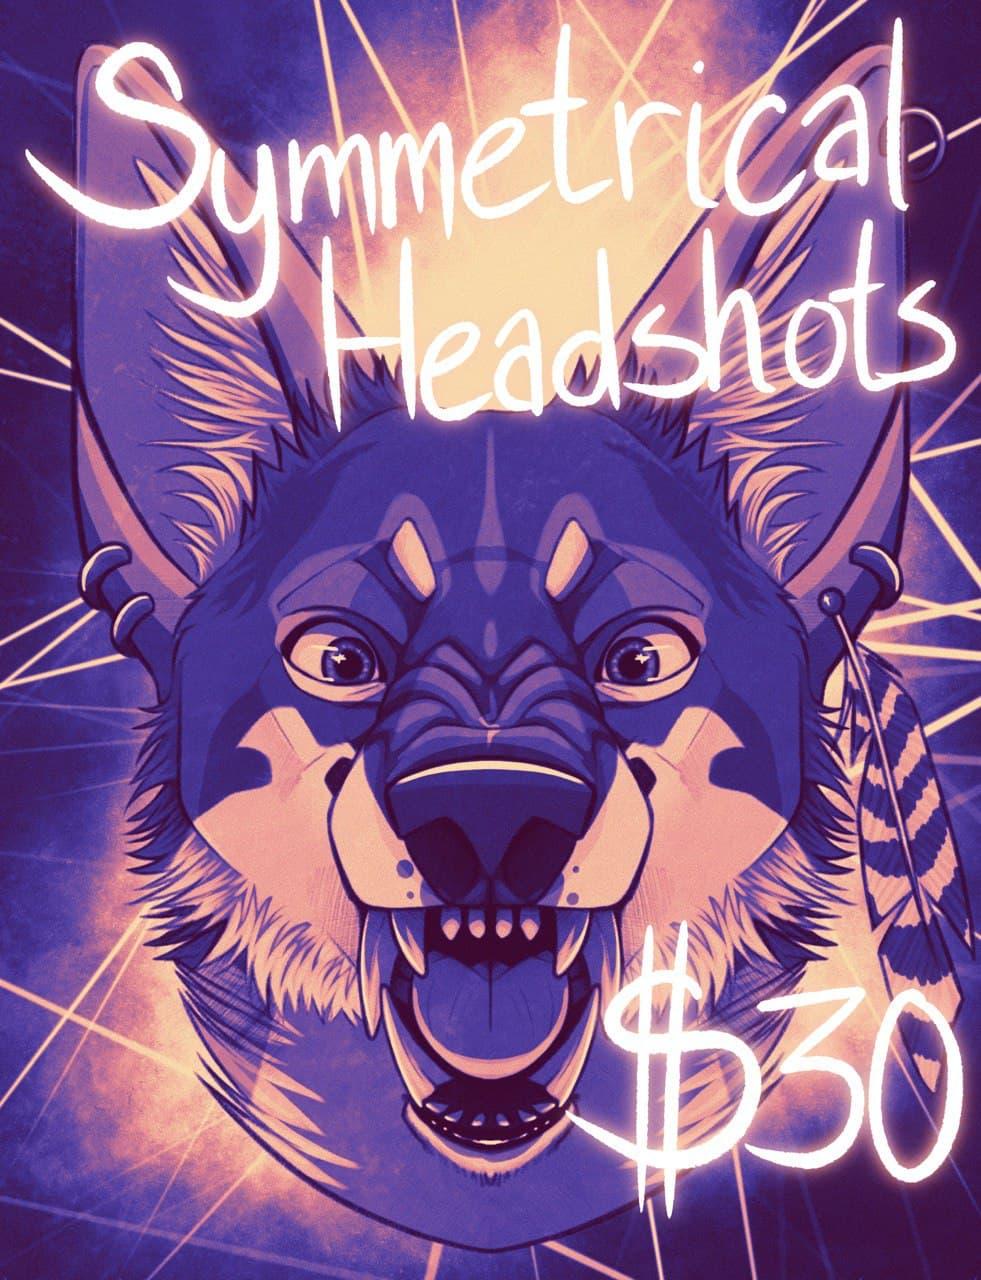 Symmetrical Headshot Sale!